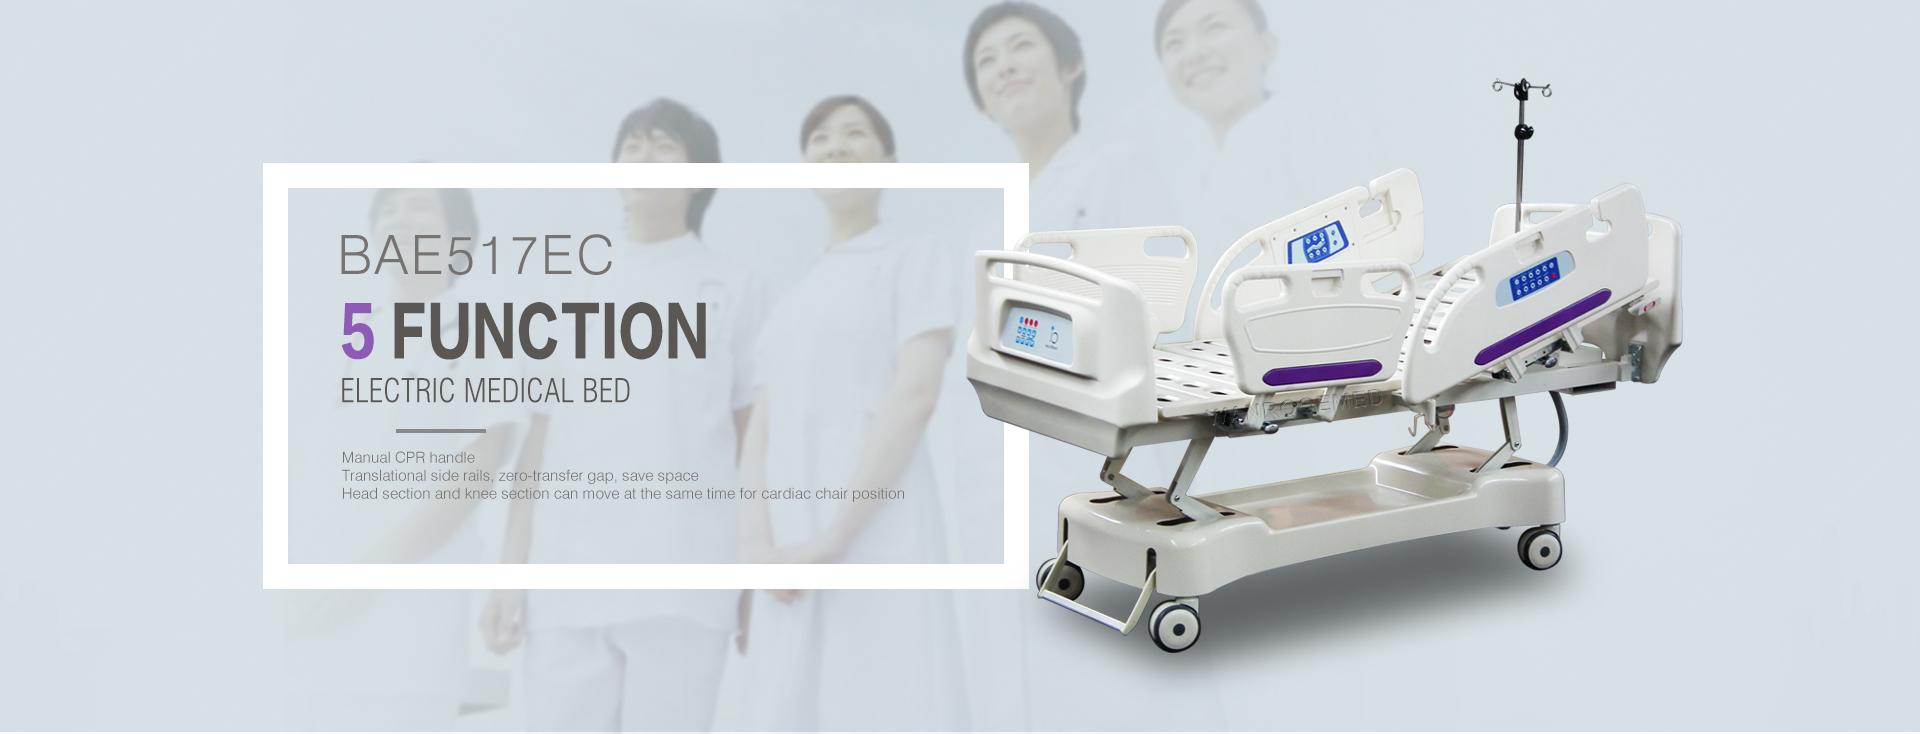 Medical Furniture Electric 5 Function Linkan Motor Hospital Trolley Bed